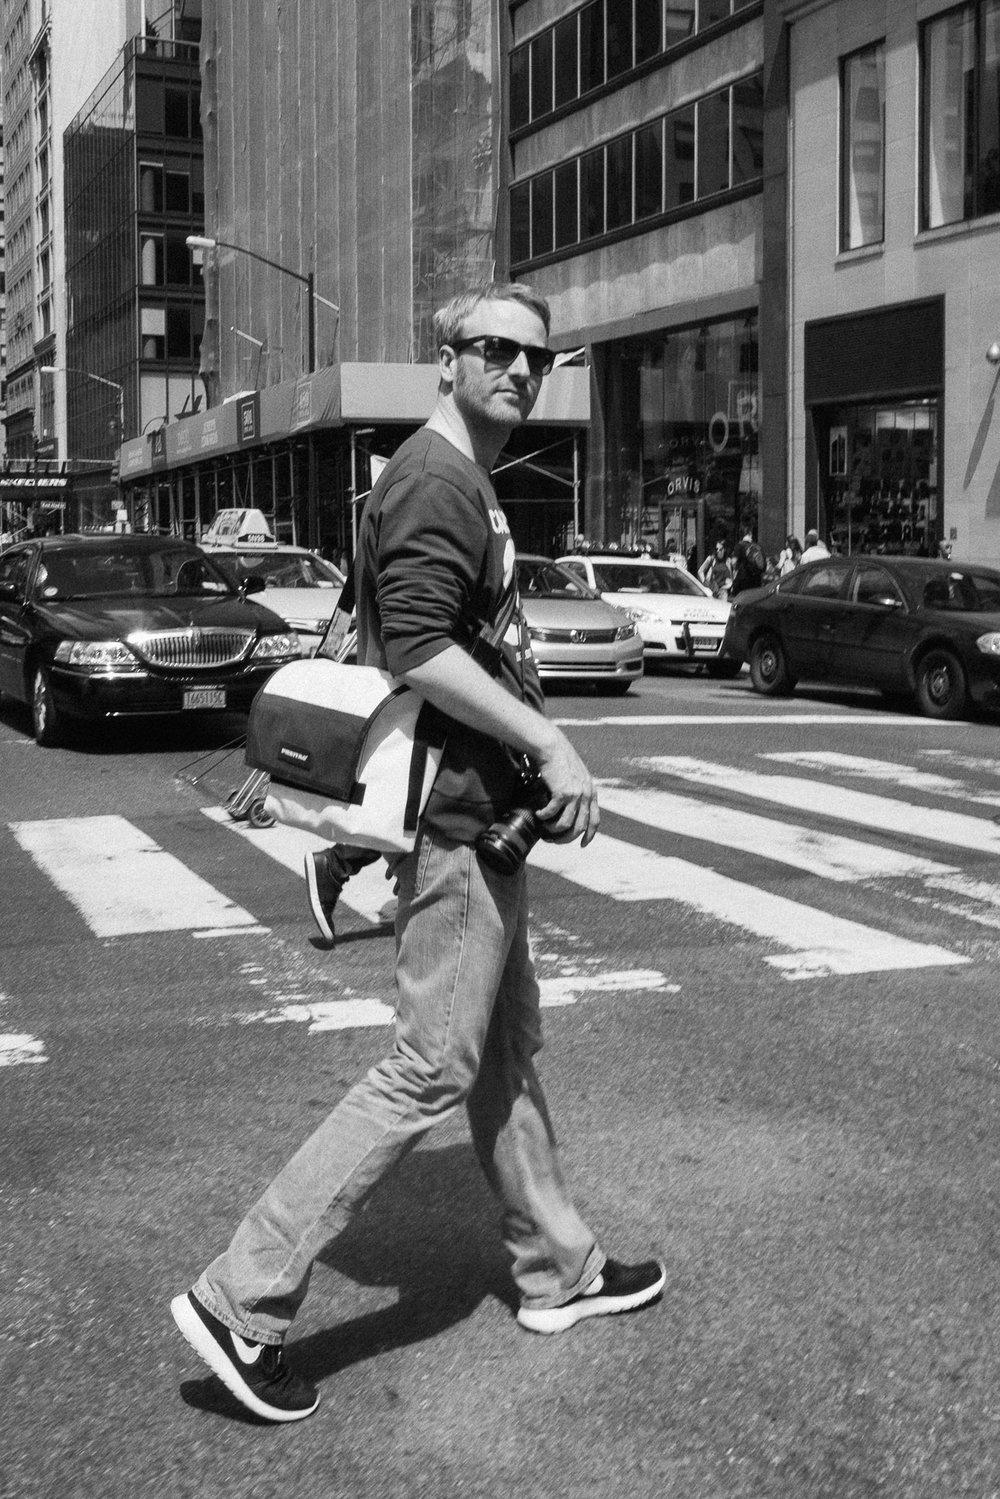 2015-05-14-NYC-0324.jpg